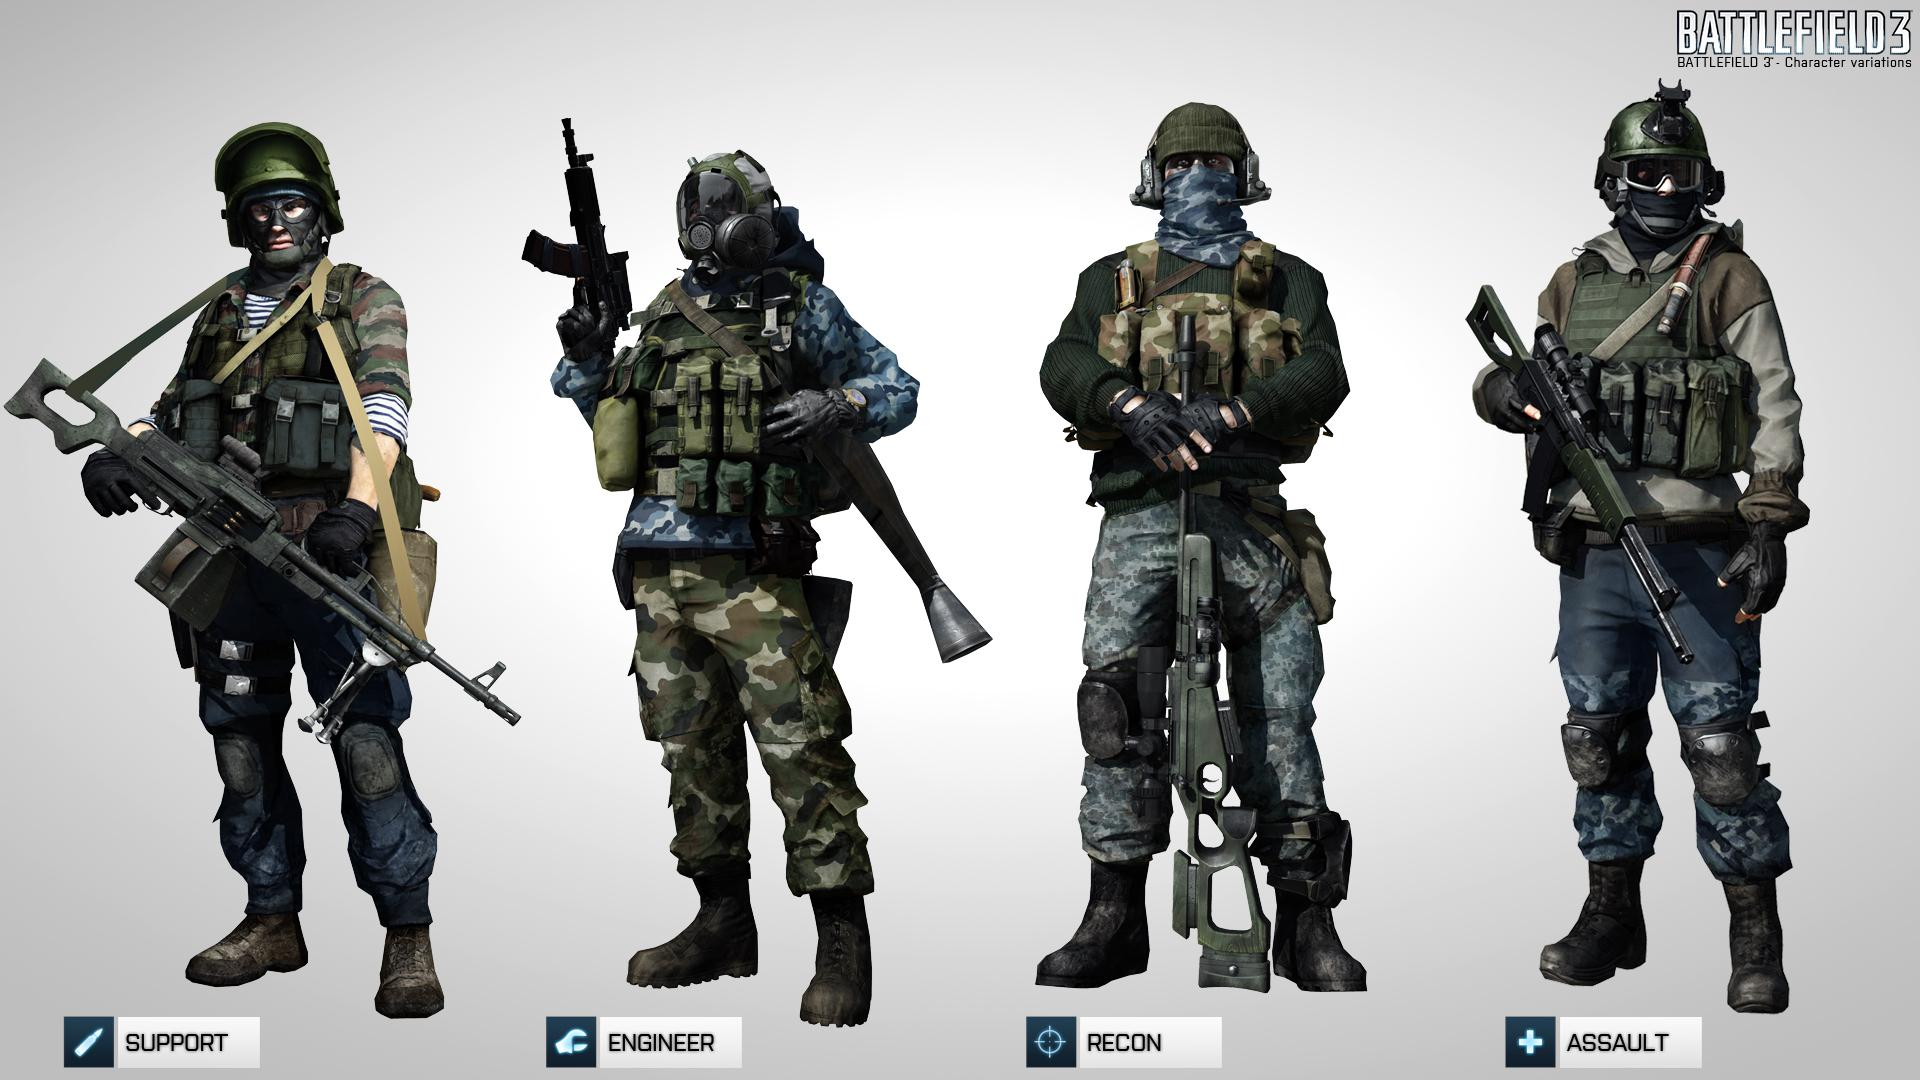 ea.com Battlefield 3 Press Kit